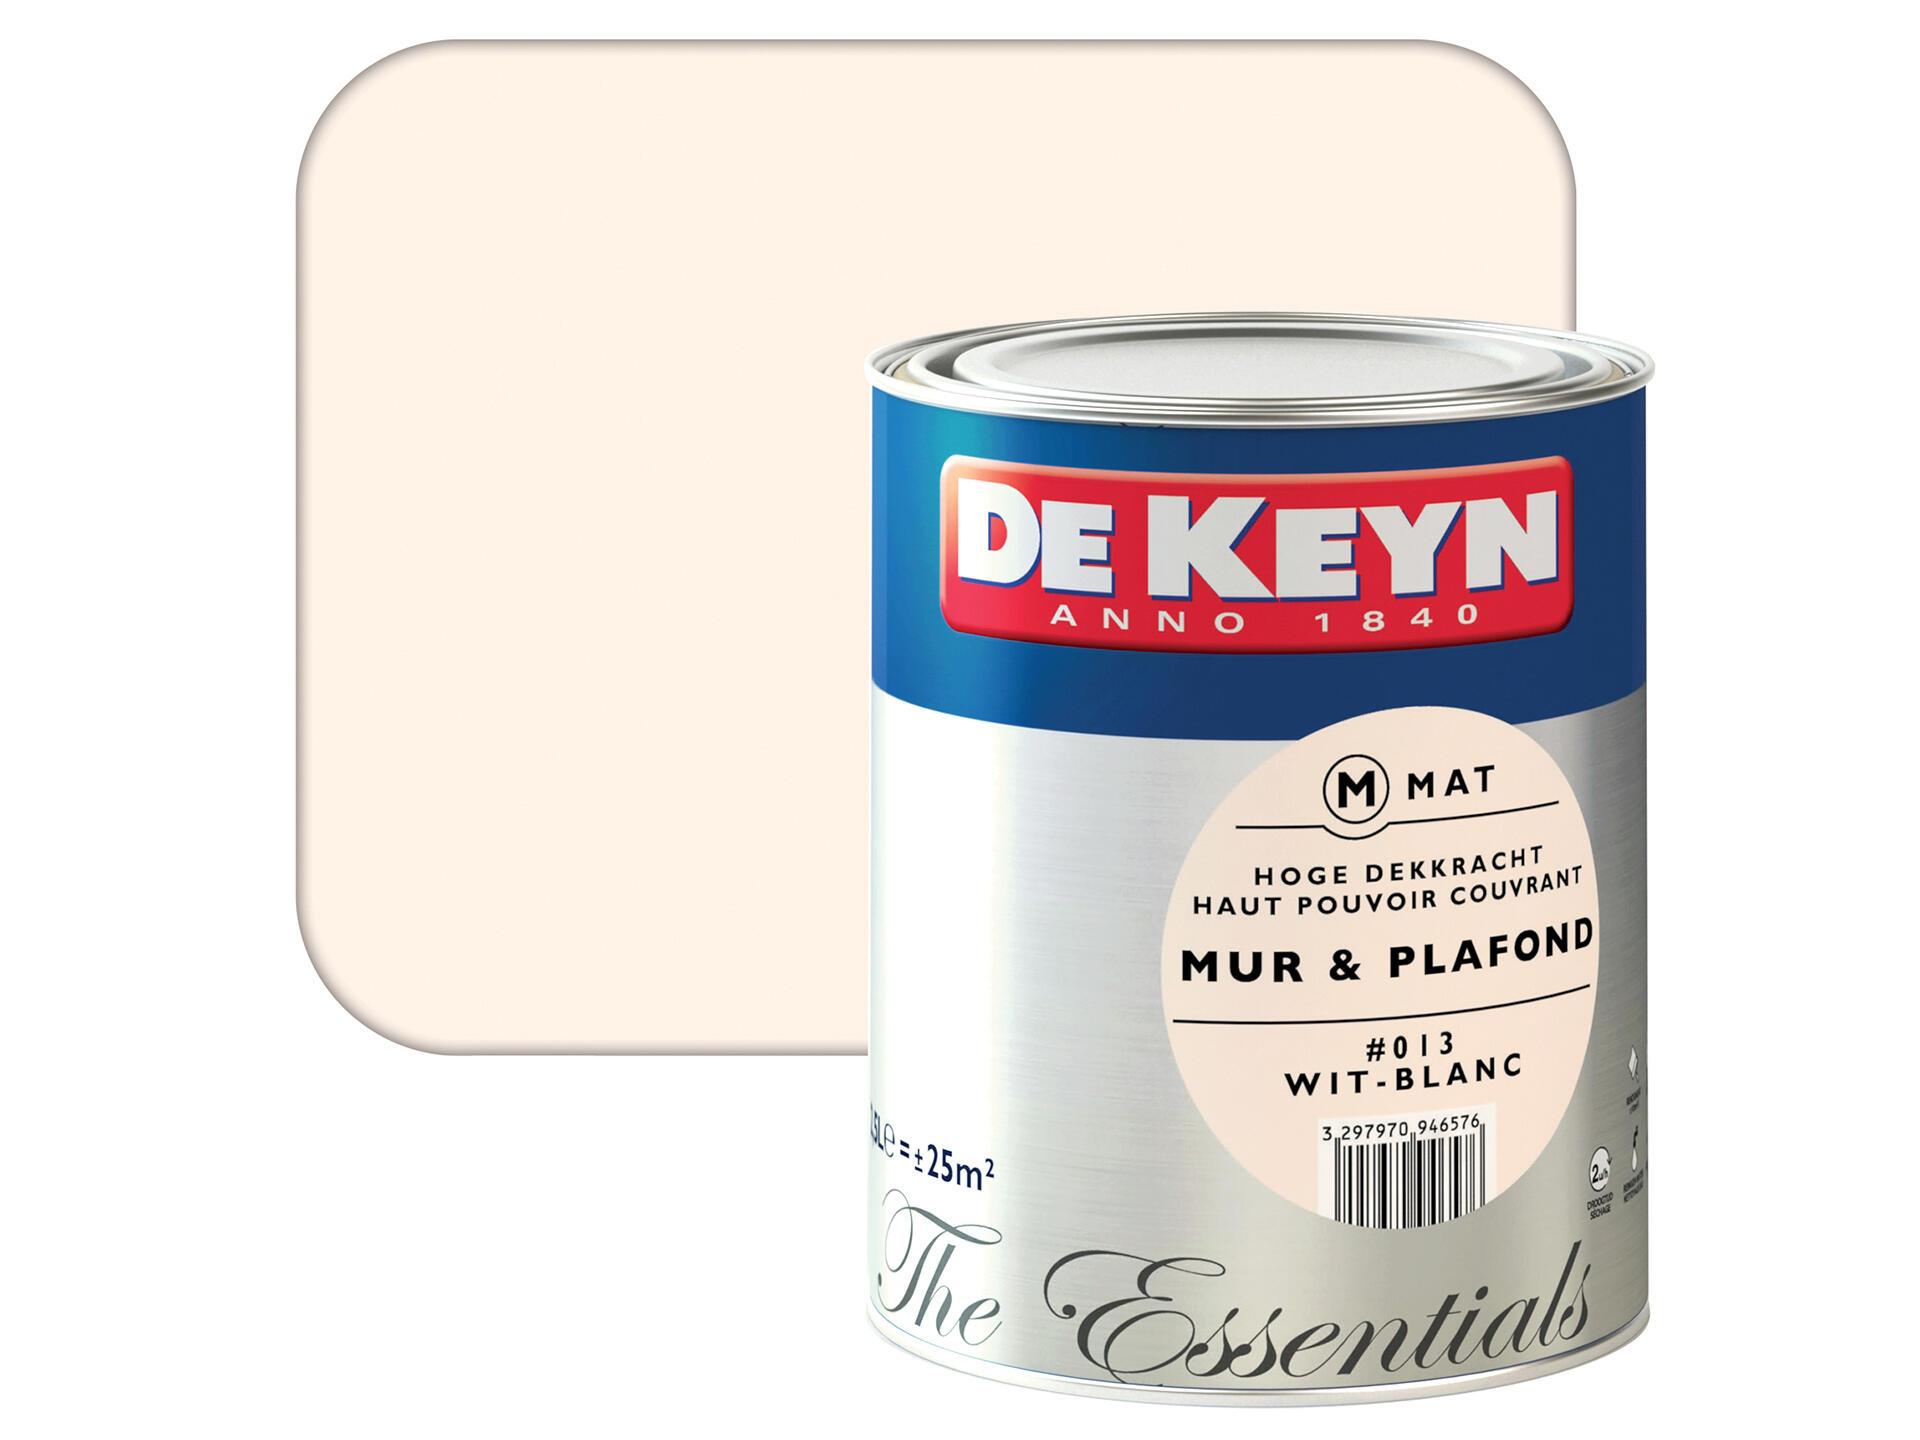 Peinture Blanc Brillant Mur Et Plafond de keyn peinture mur & plafond satin 2,5l blanc #013